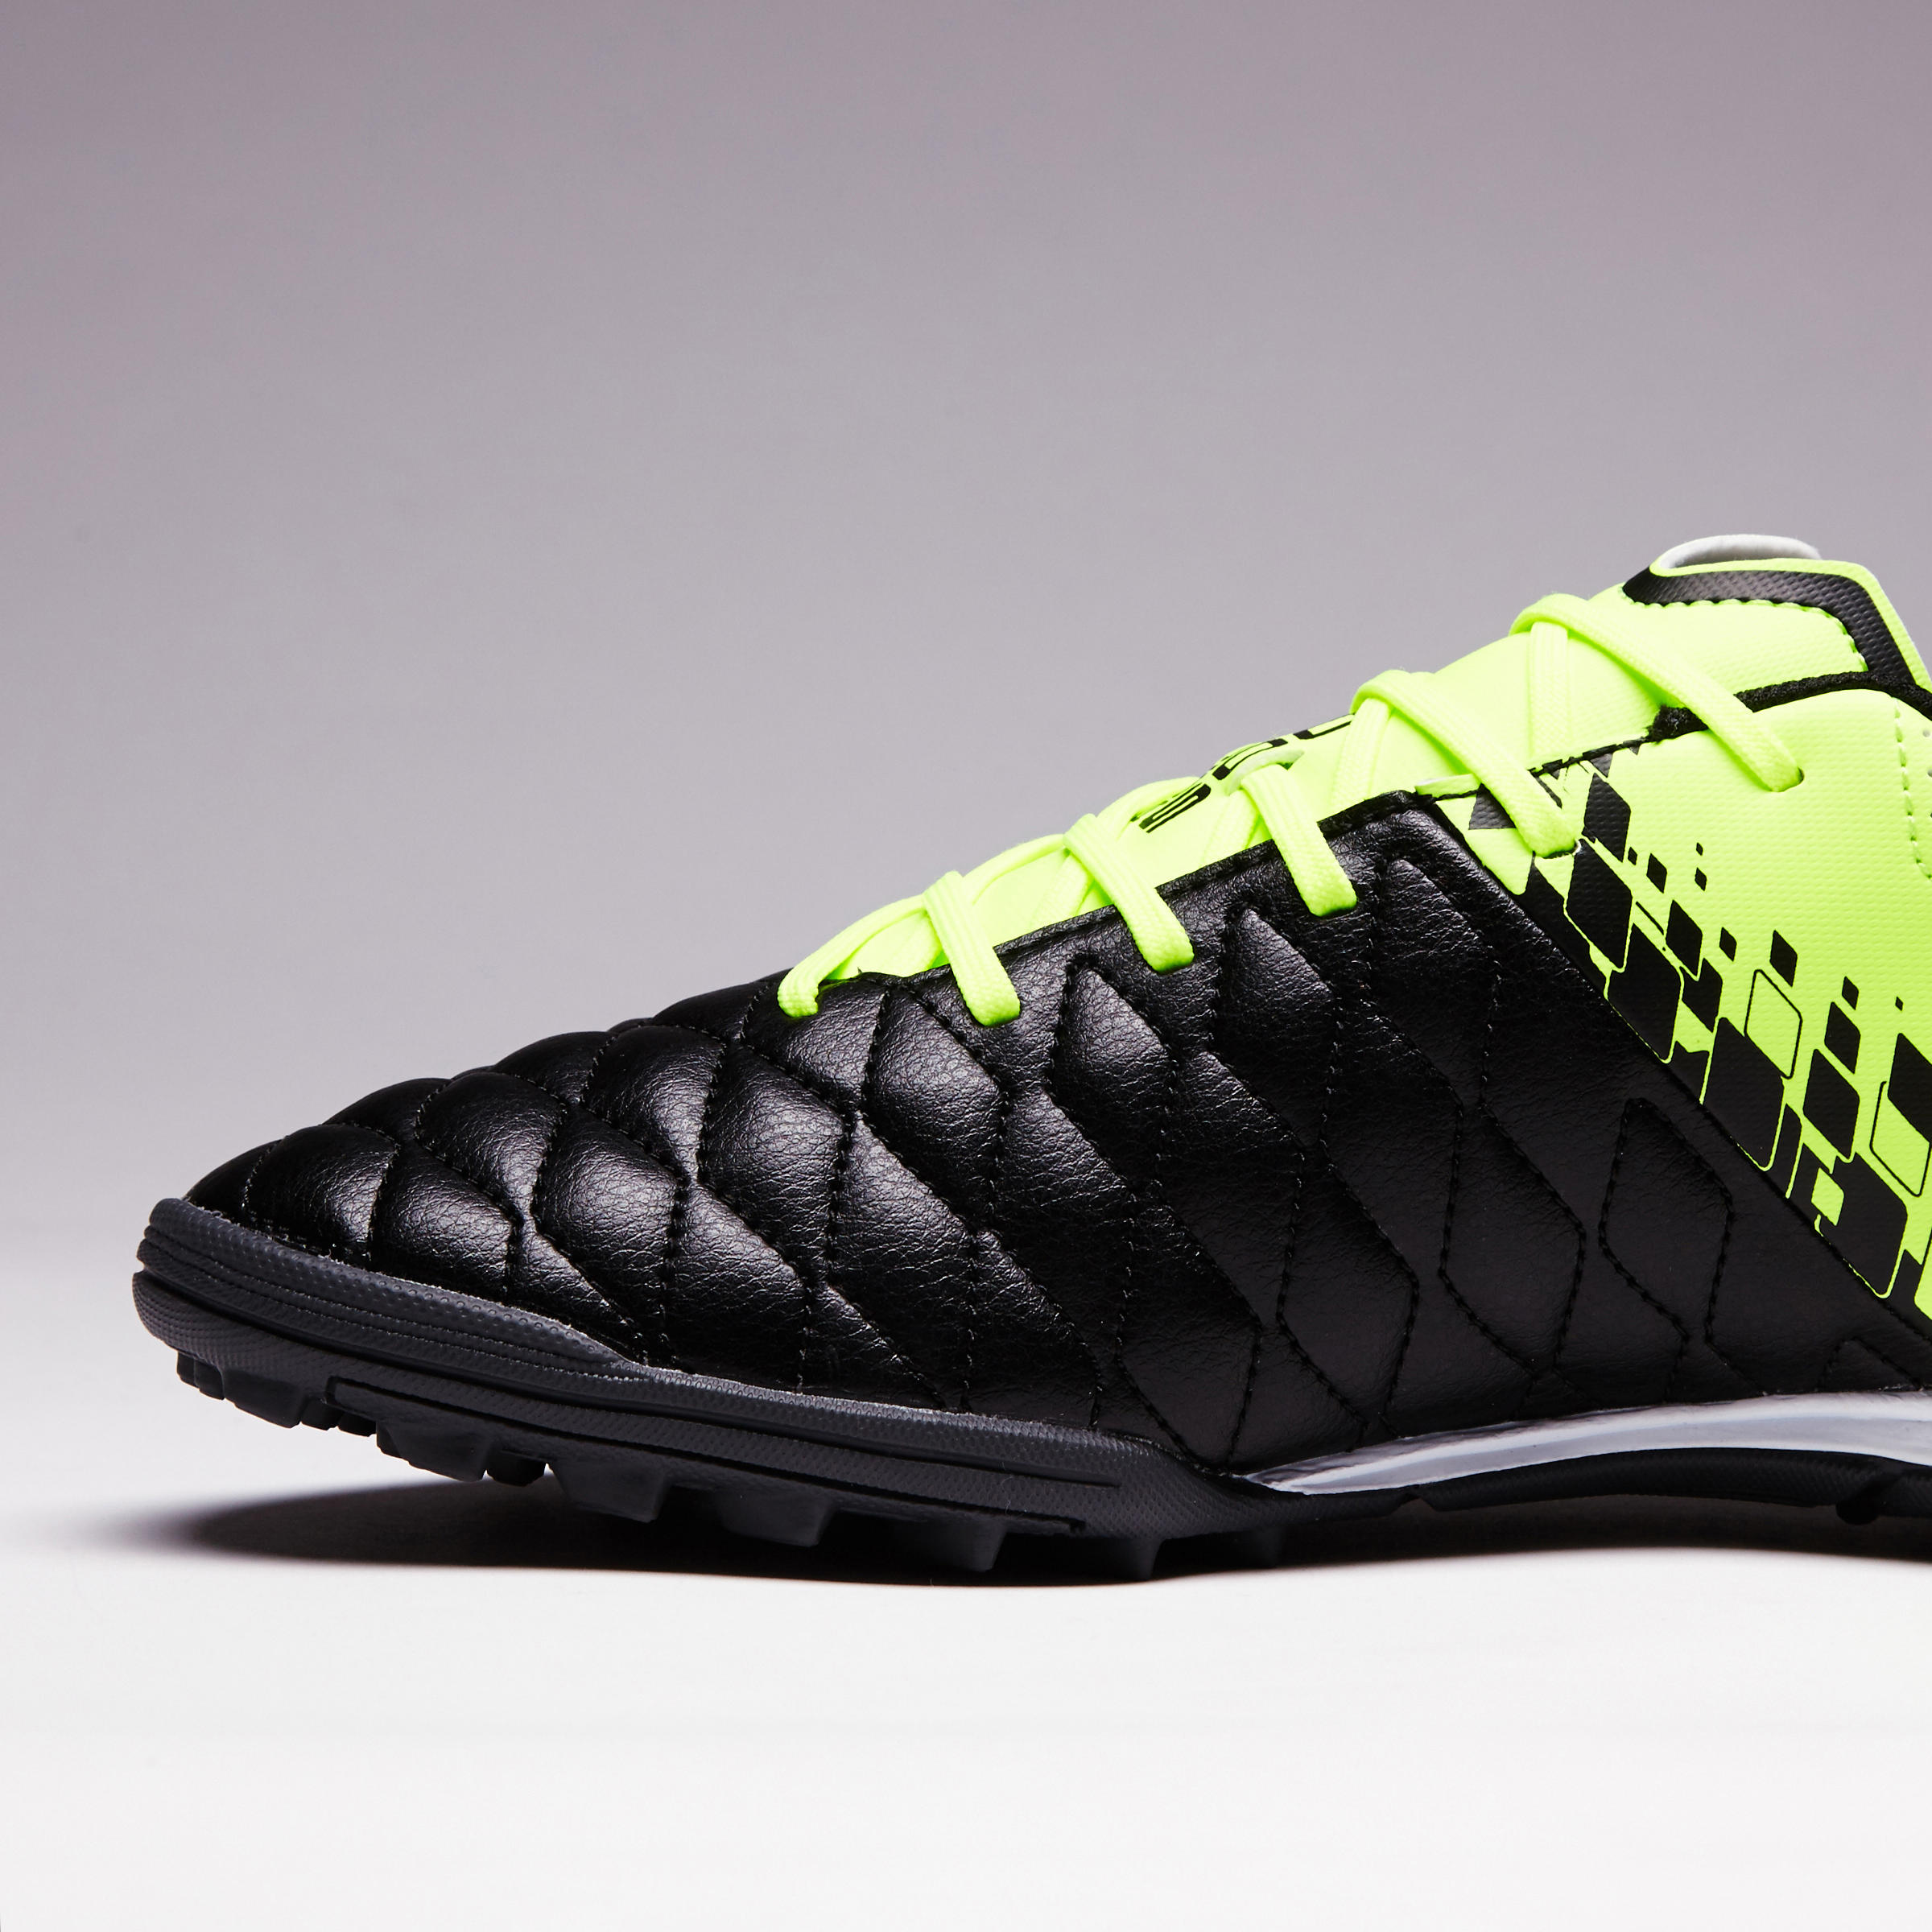 Football Agility Jaune Terrain 500 Noireamp; Hg Adulte Chaussure Dur De OkTiXuwPZ